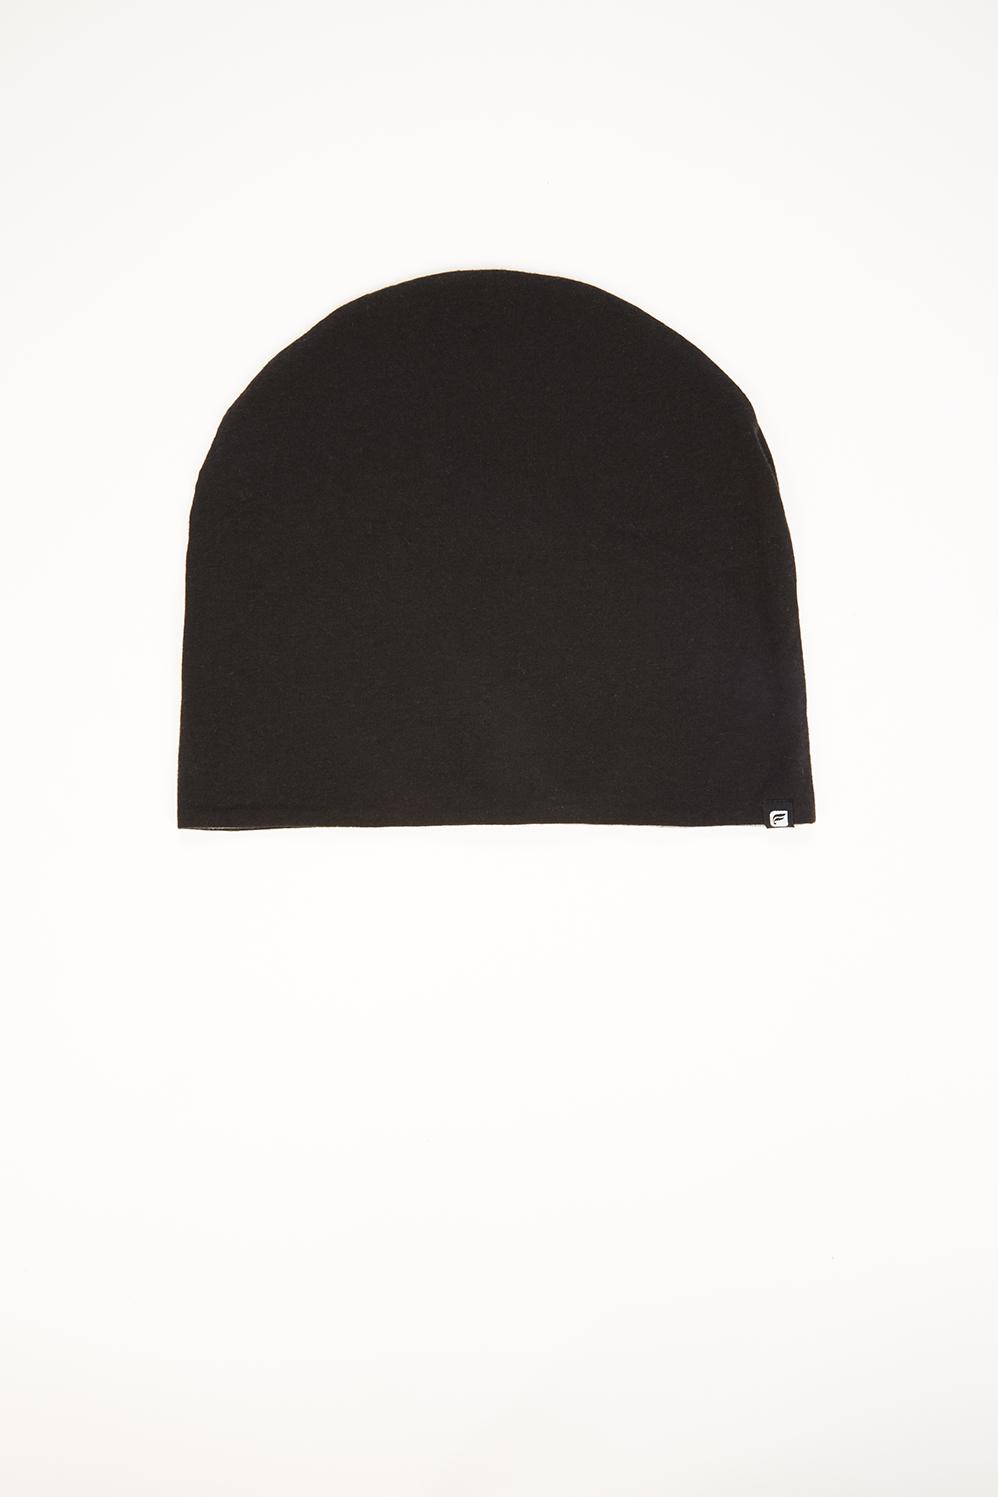 7881cd82 The Reversible Jersey Beanie - Black/Grey Heather